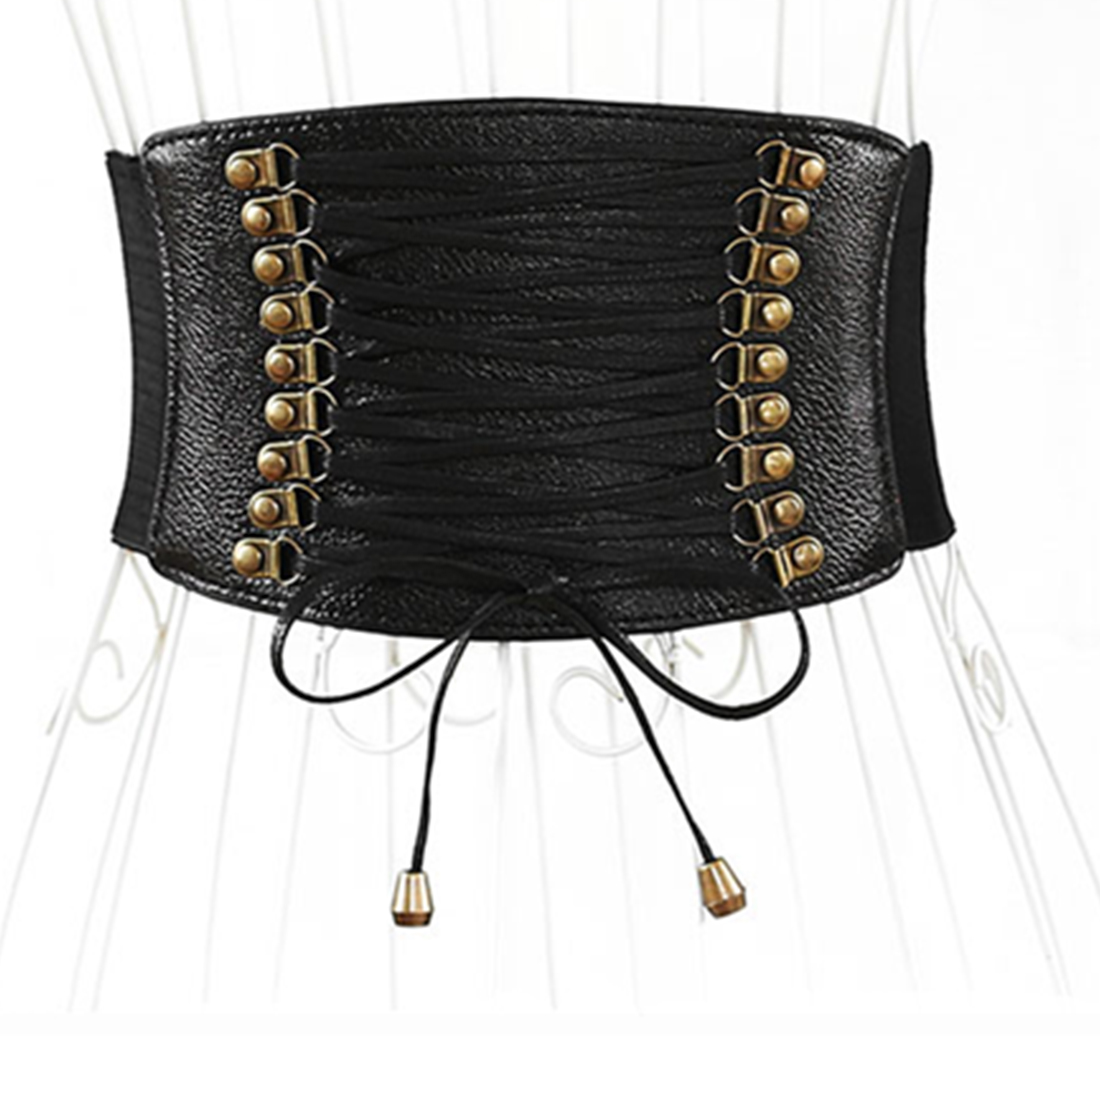 Chicever Autumn Print Hit Colors Belts For Women Wide Waistband High Waist Pu Leather Belt Female Dress Accessories Fashion Tide Sales Of Quality Assurance Women's Belts